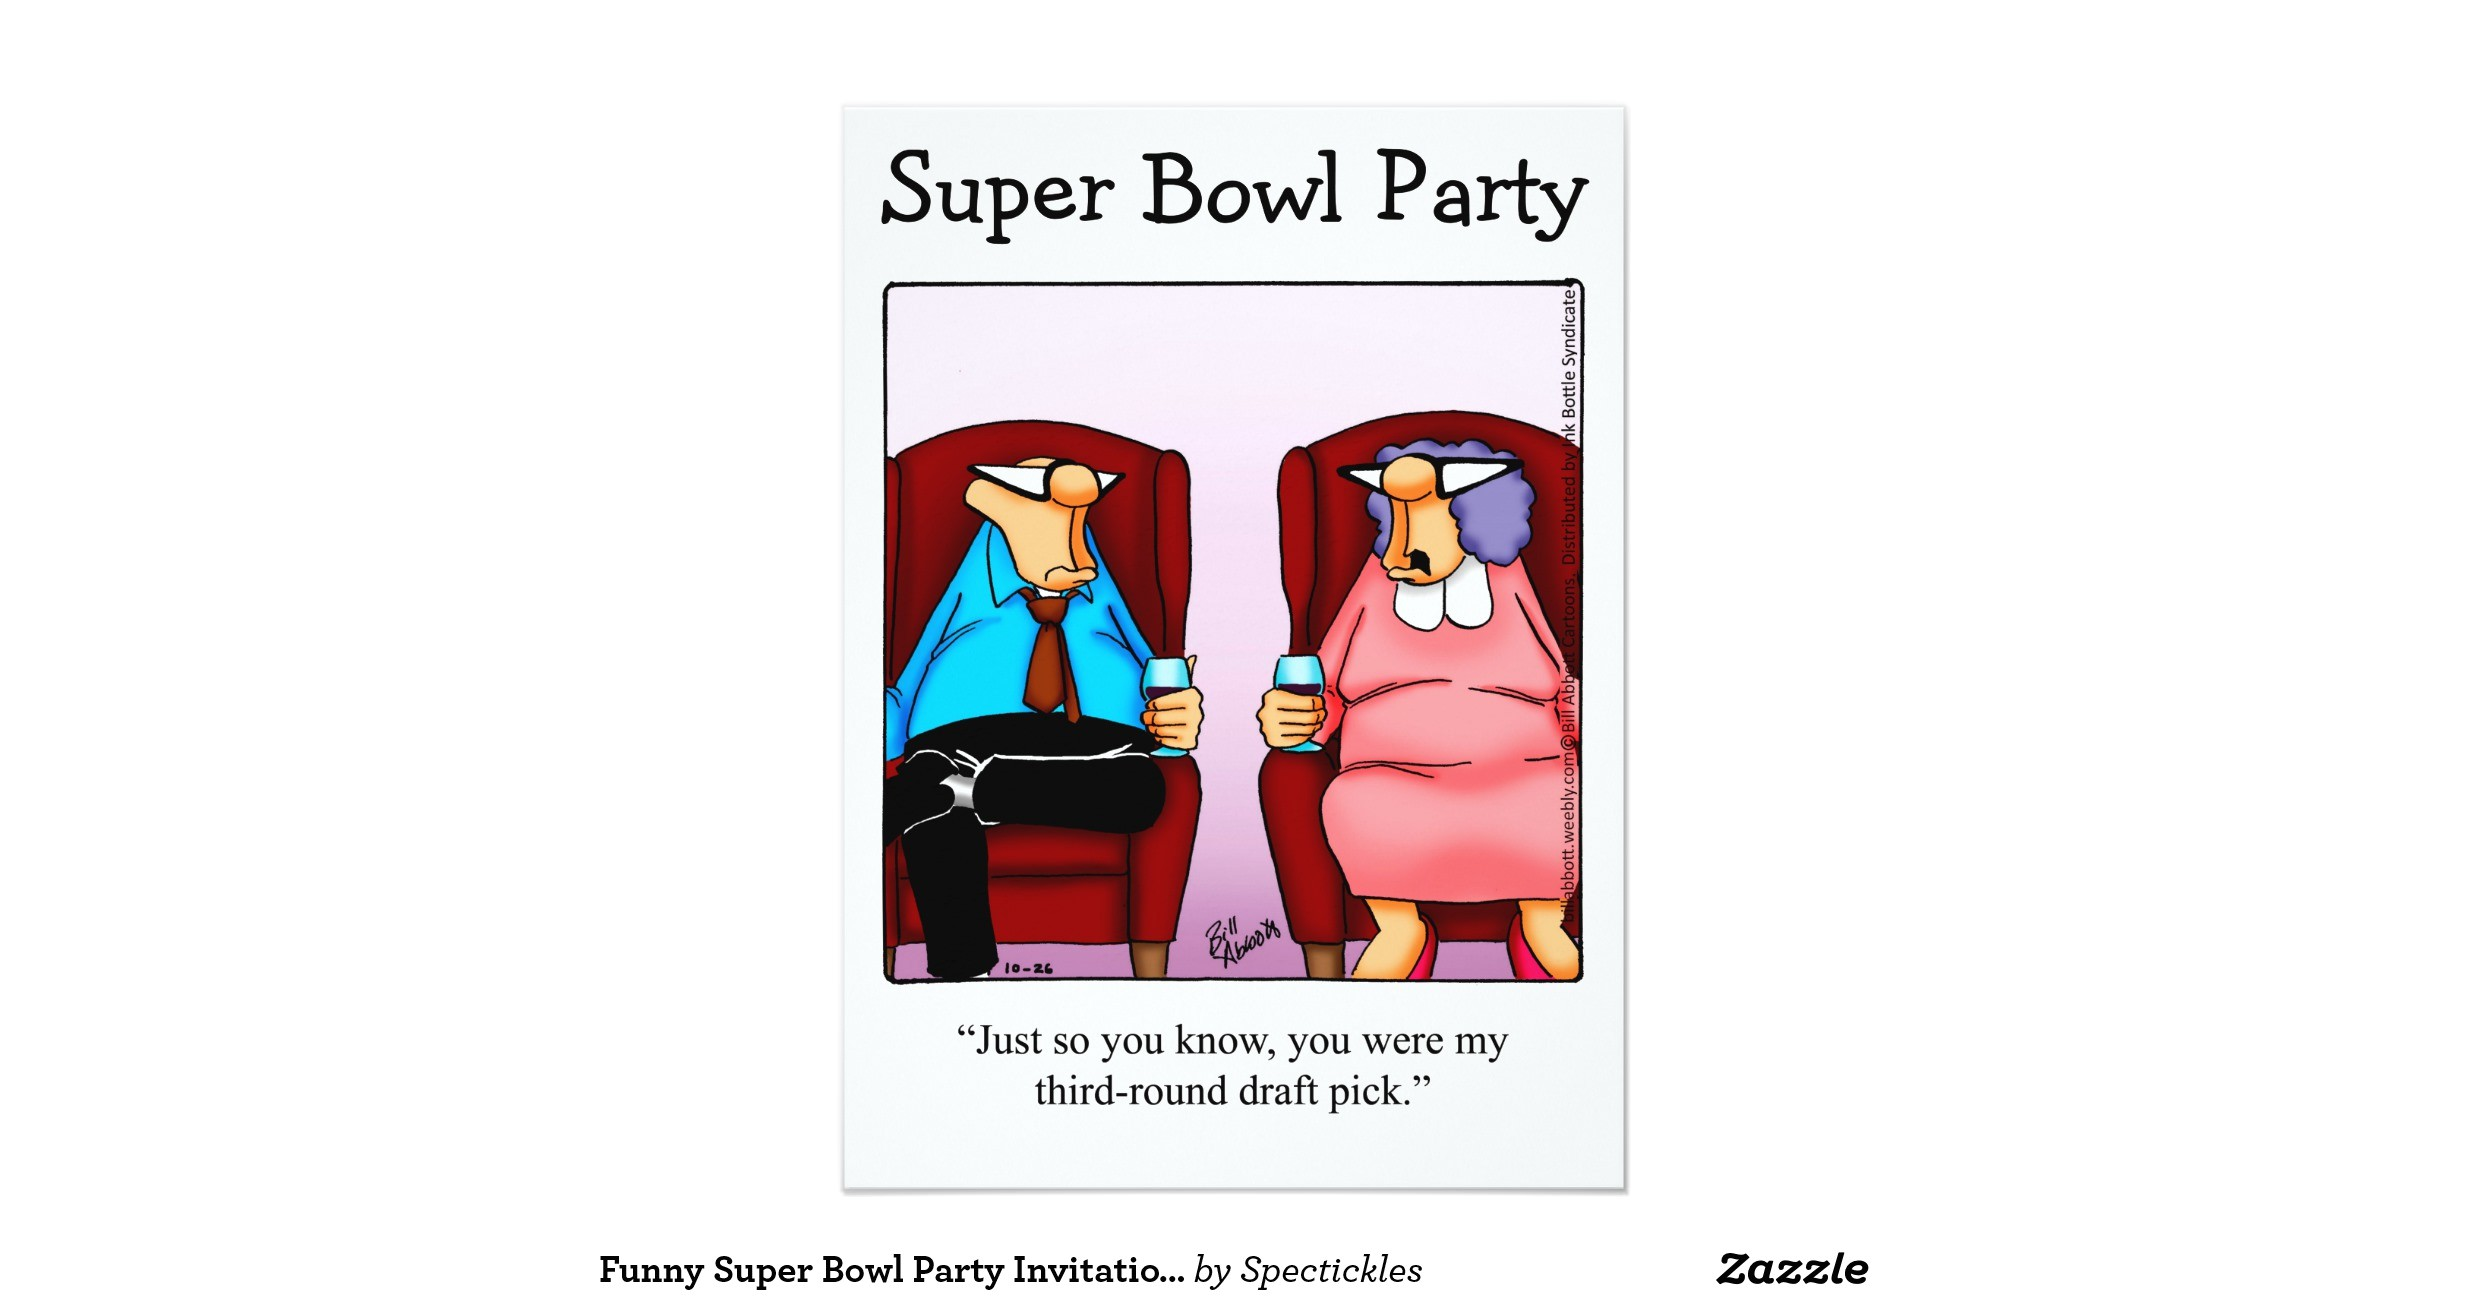 Funny Super Bowl Party Invitation Wording Funny Super Bowl Party Invitations